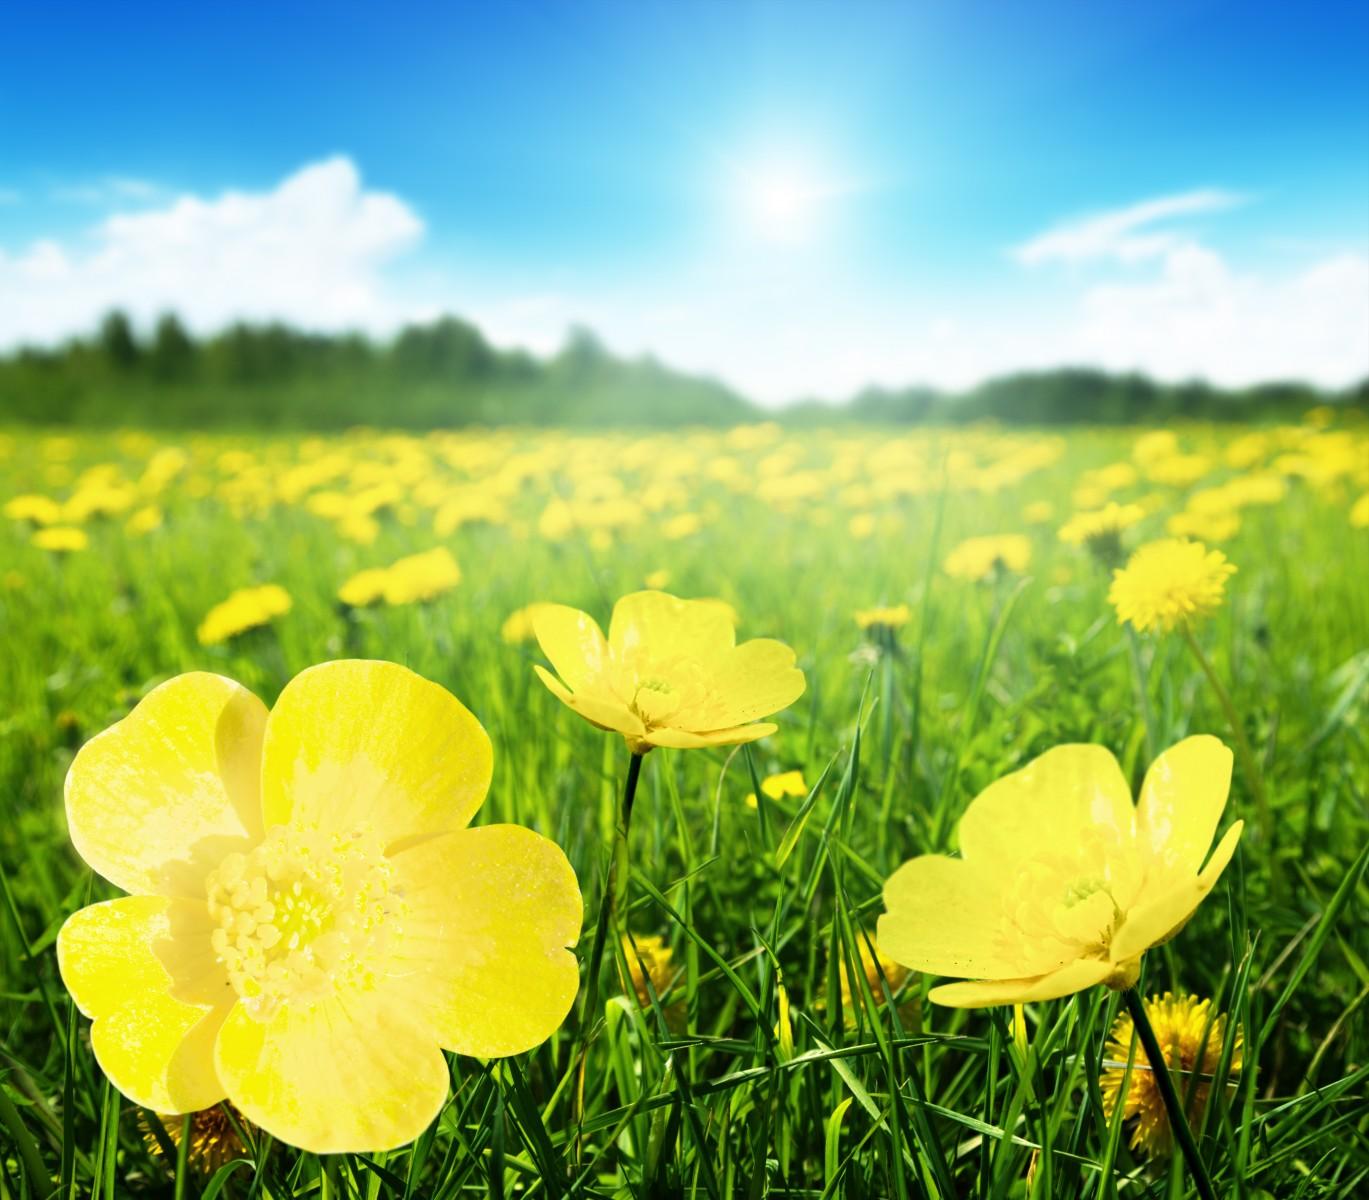 A Beautiful Sunny Day HD wallpaper  |Sunny Beautiful Day